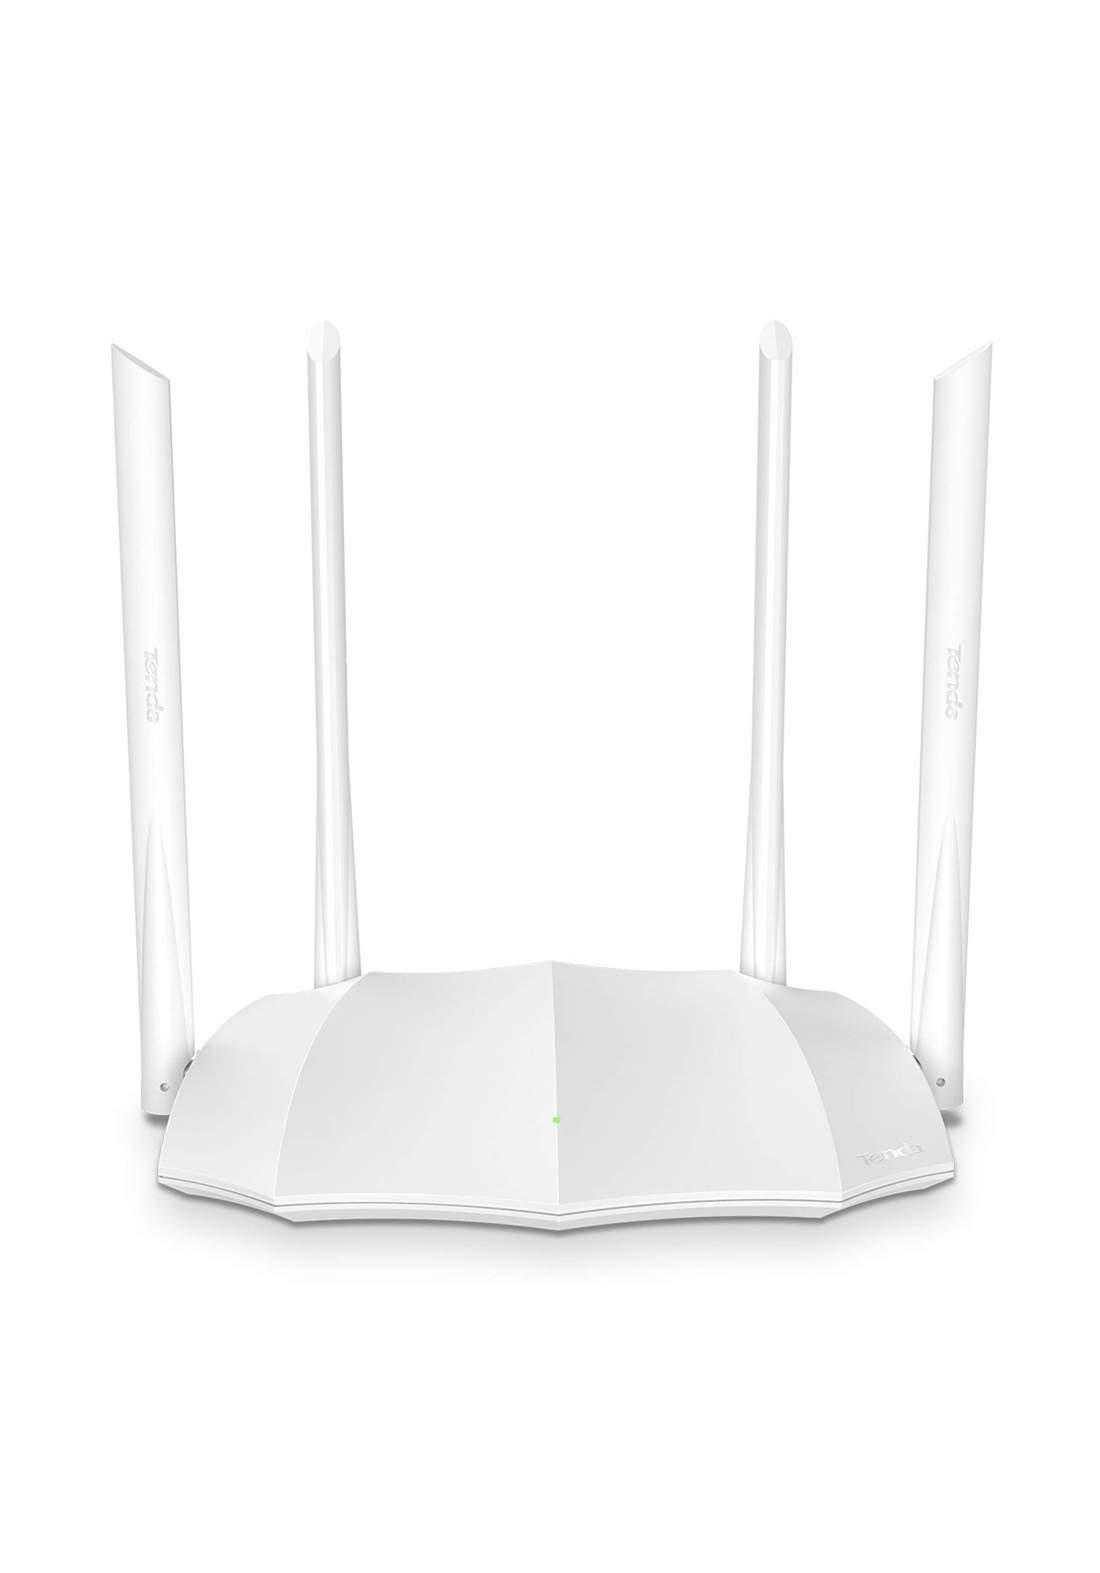 Tenda AC5 AC5S Smart Dual Band 5dBi External Antenna - White